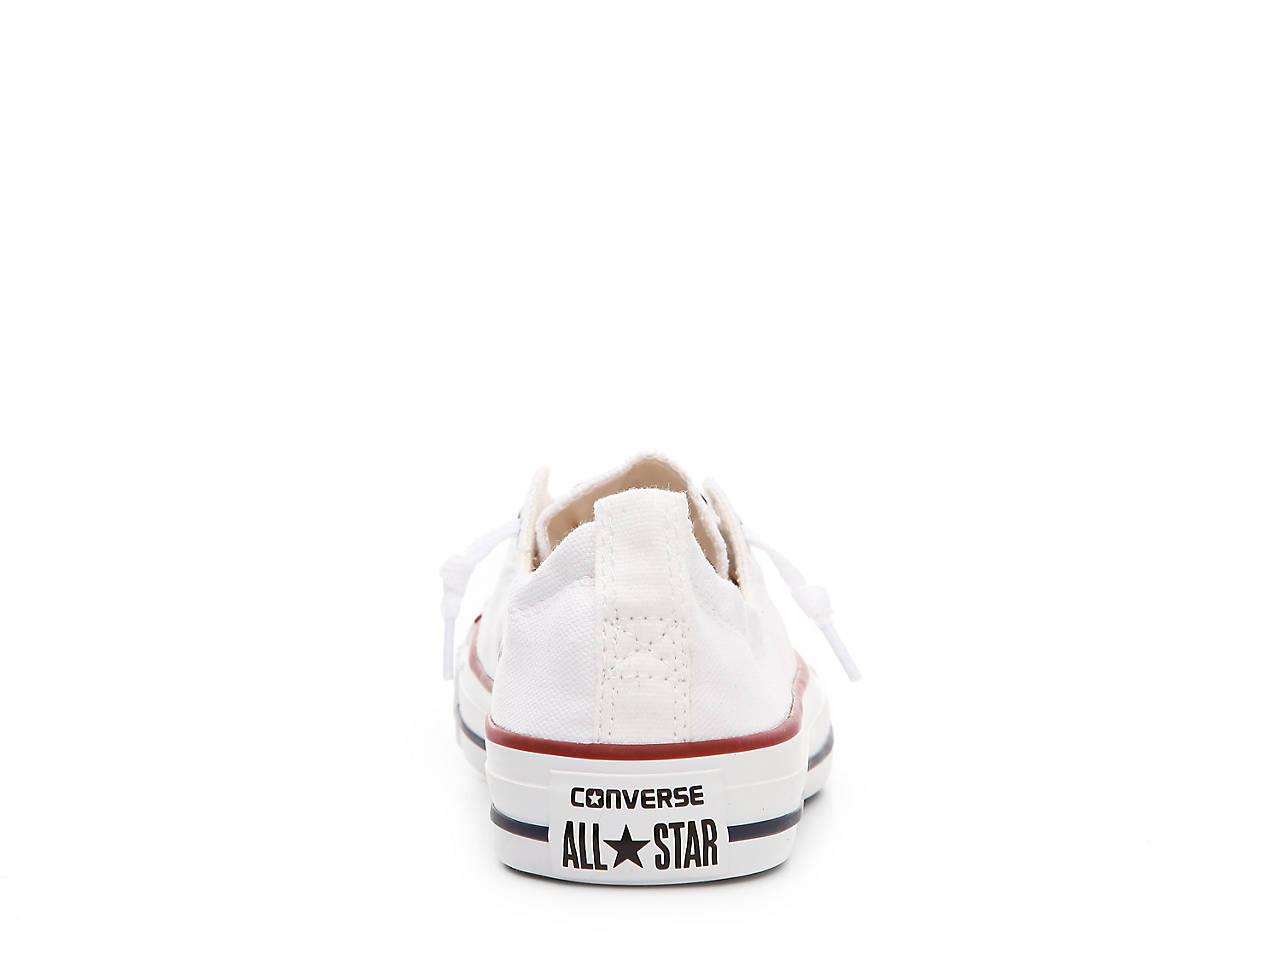 ec1b06603d Converse Chuck Taylor All Star Shoreline Slip-On Sneaker - Women's ...